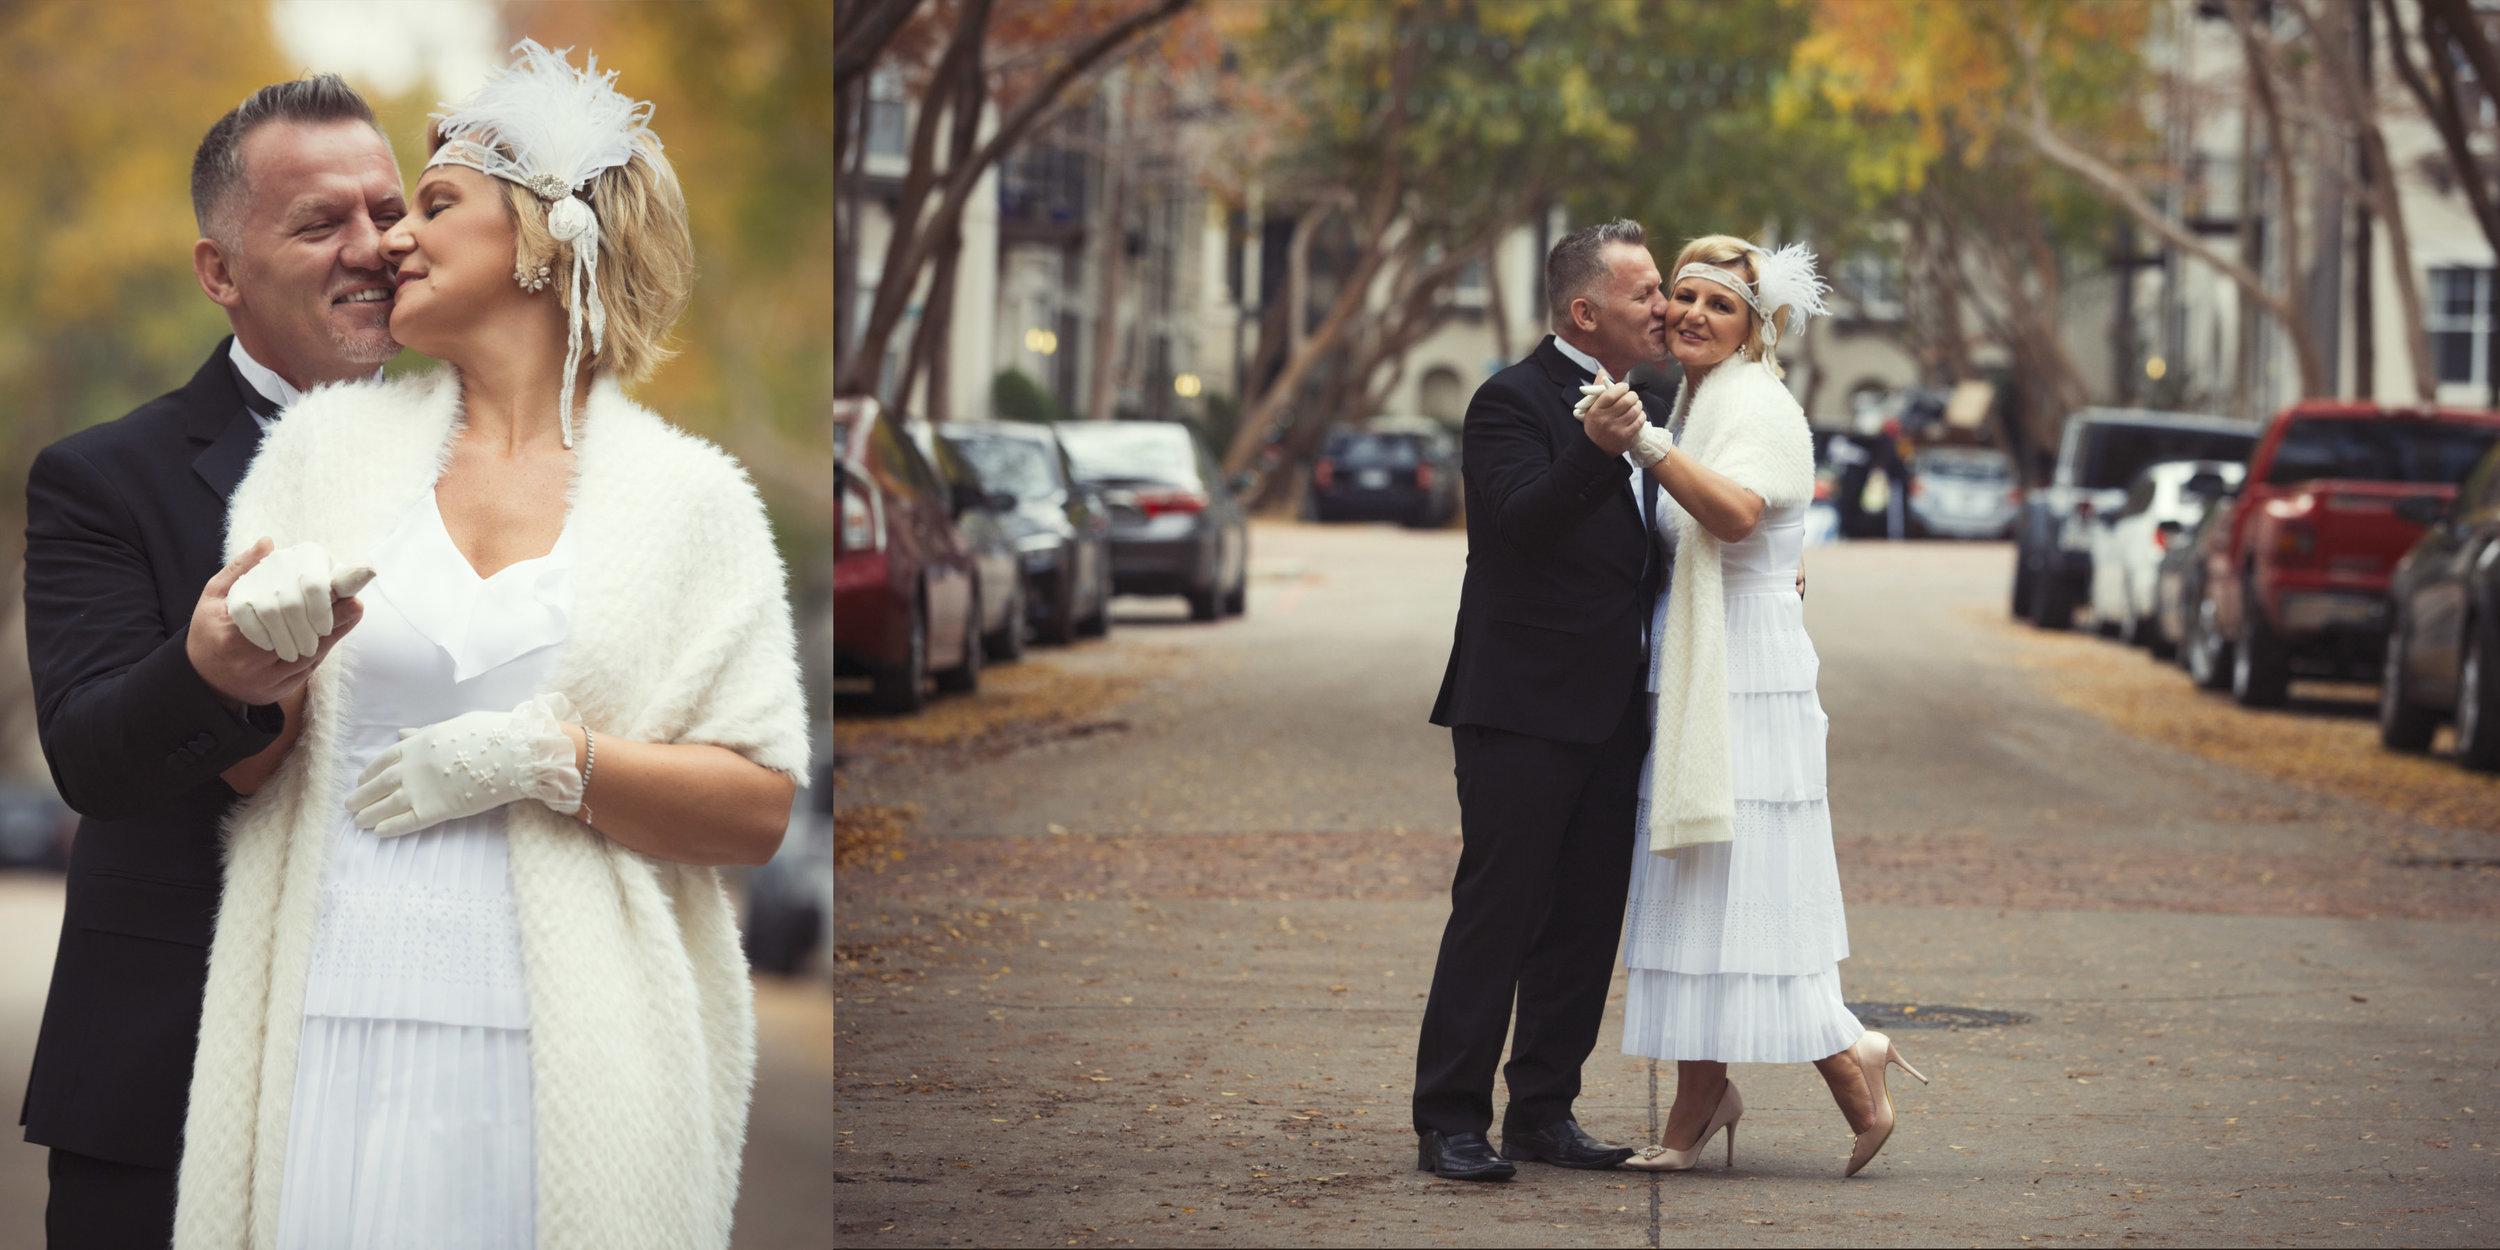 Dallas Portraits Beauty Engagement Photographer -3.jpg